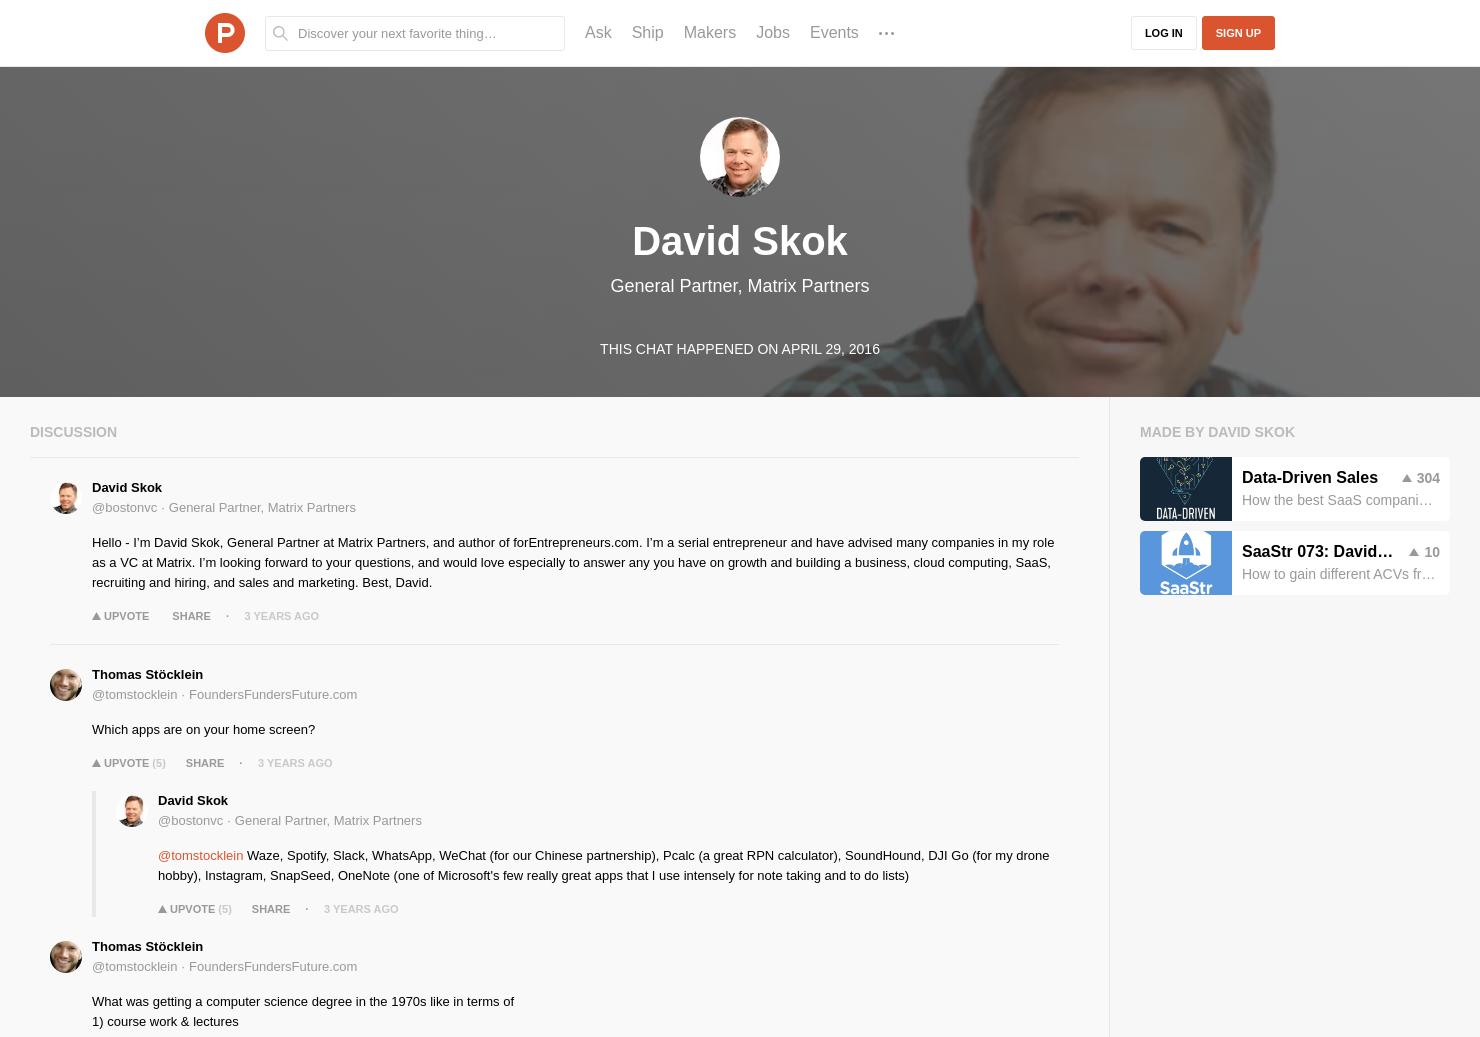 David Skok LIVE Chat on Product Hunt